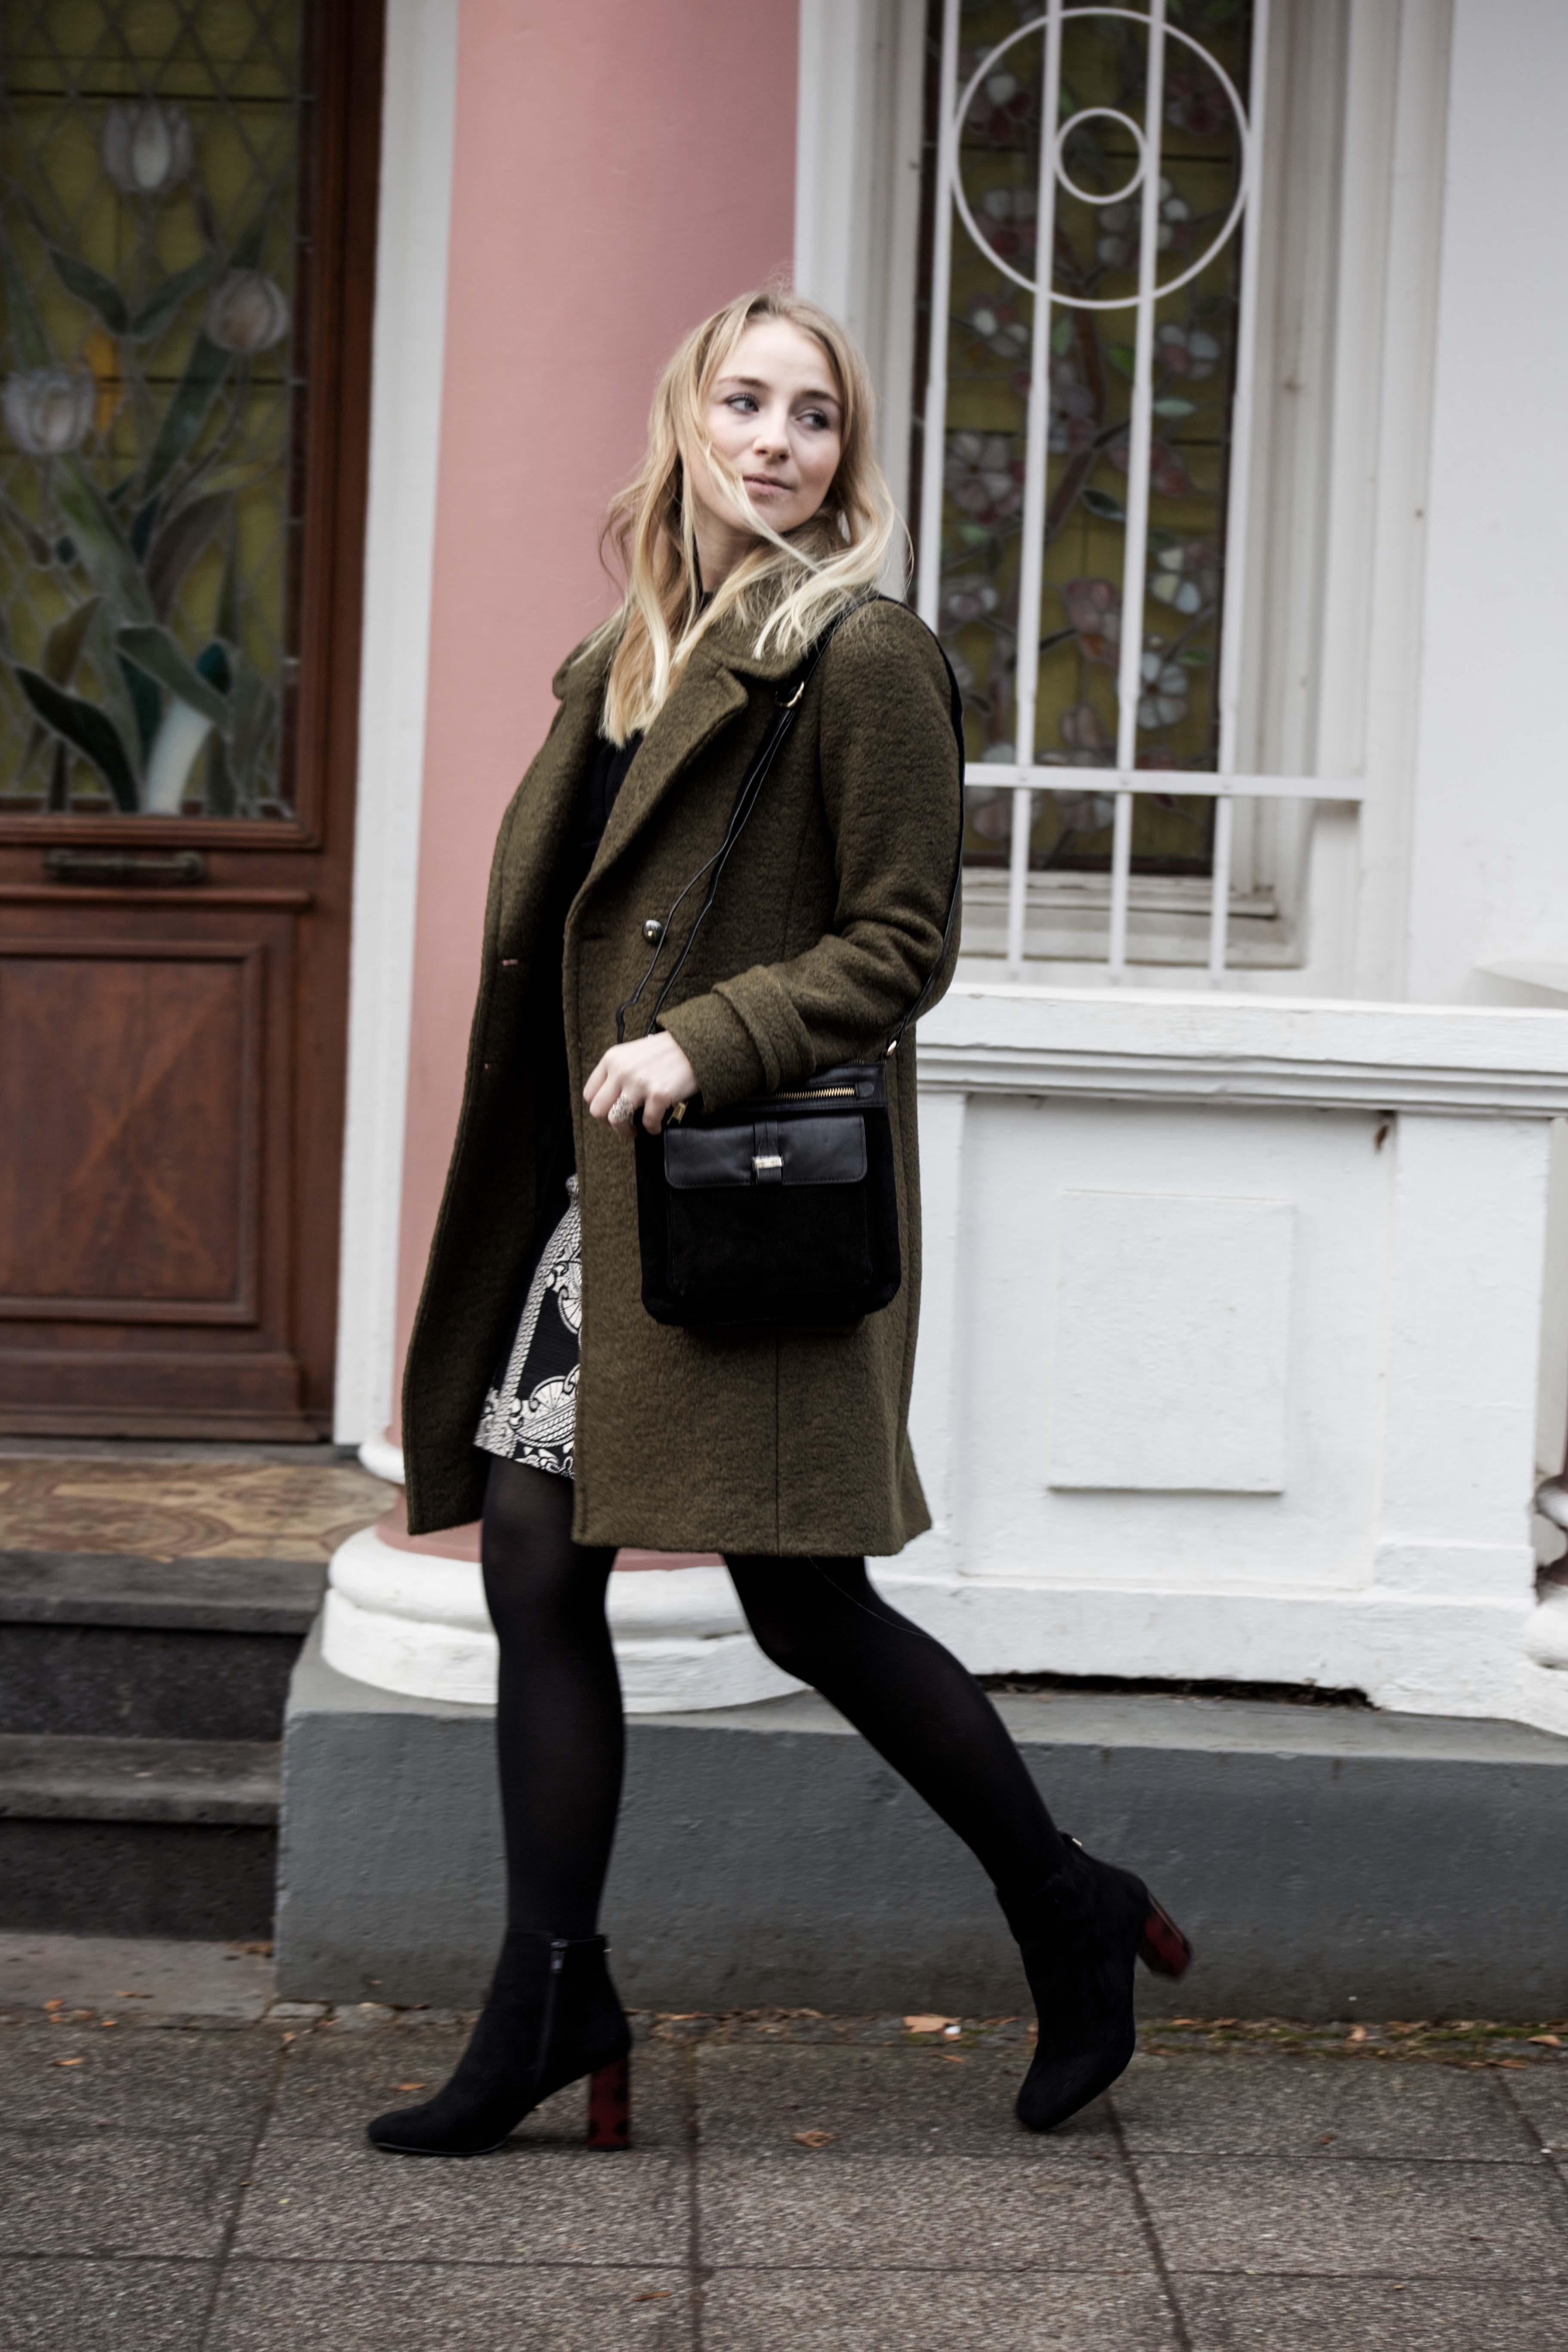 streetstyle-bonn-waldgrüner-mantel-rock-muster-print-fashionblogger-modeblog-mode-outfit_0069